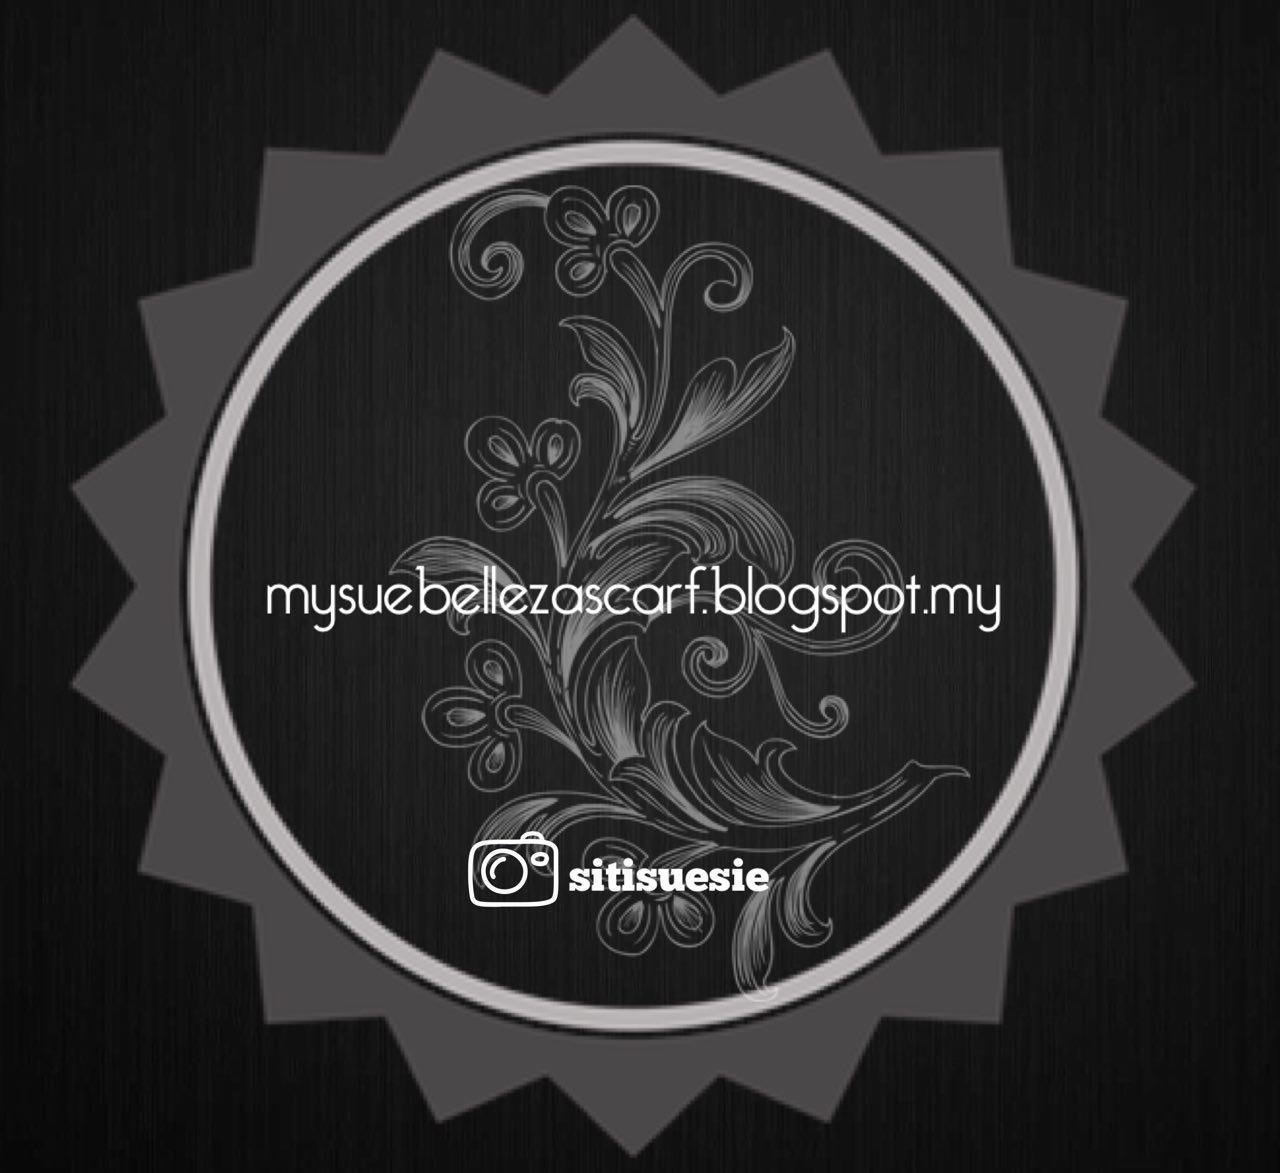 mysuebellezascarf.blogspot.my